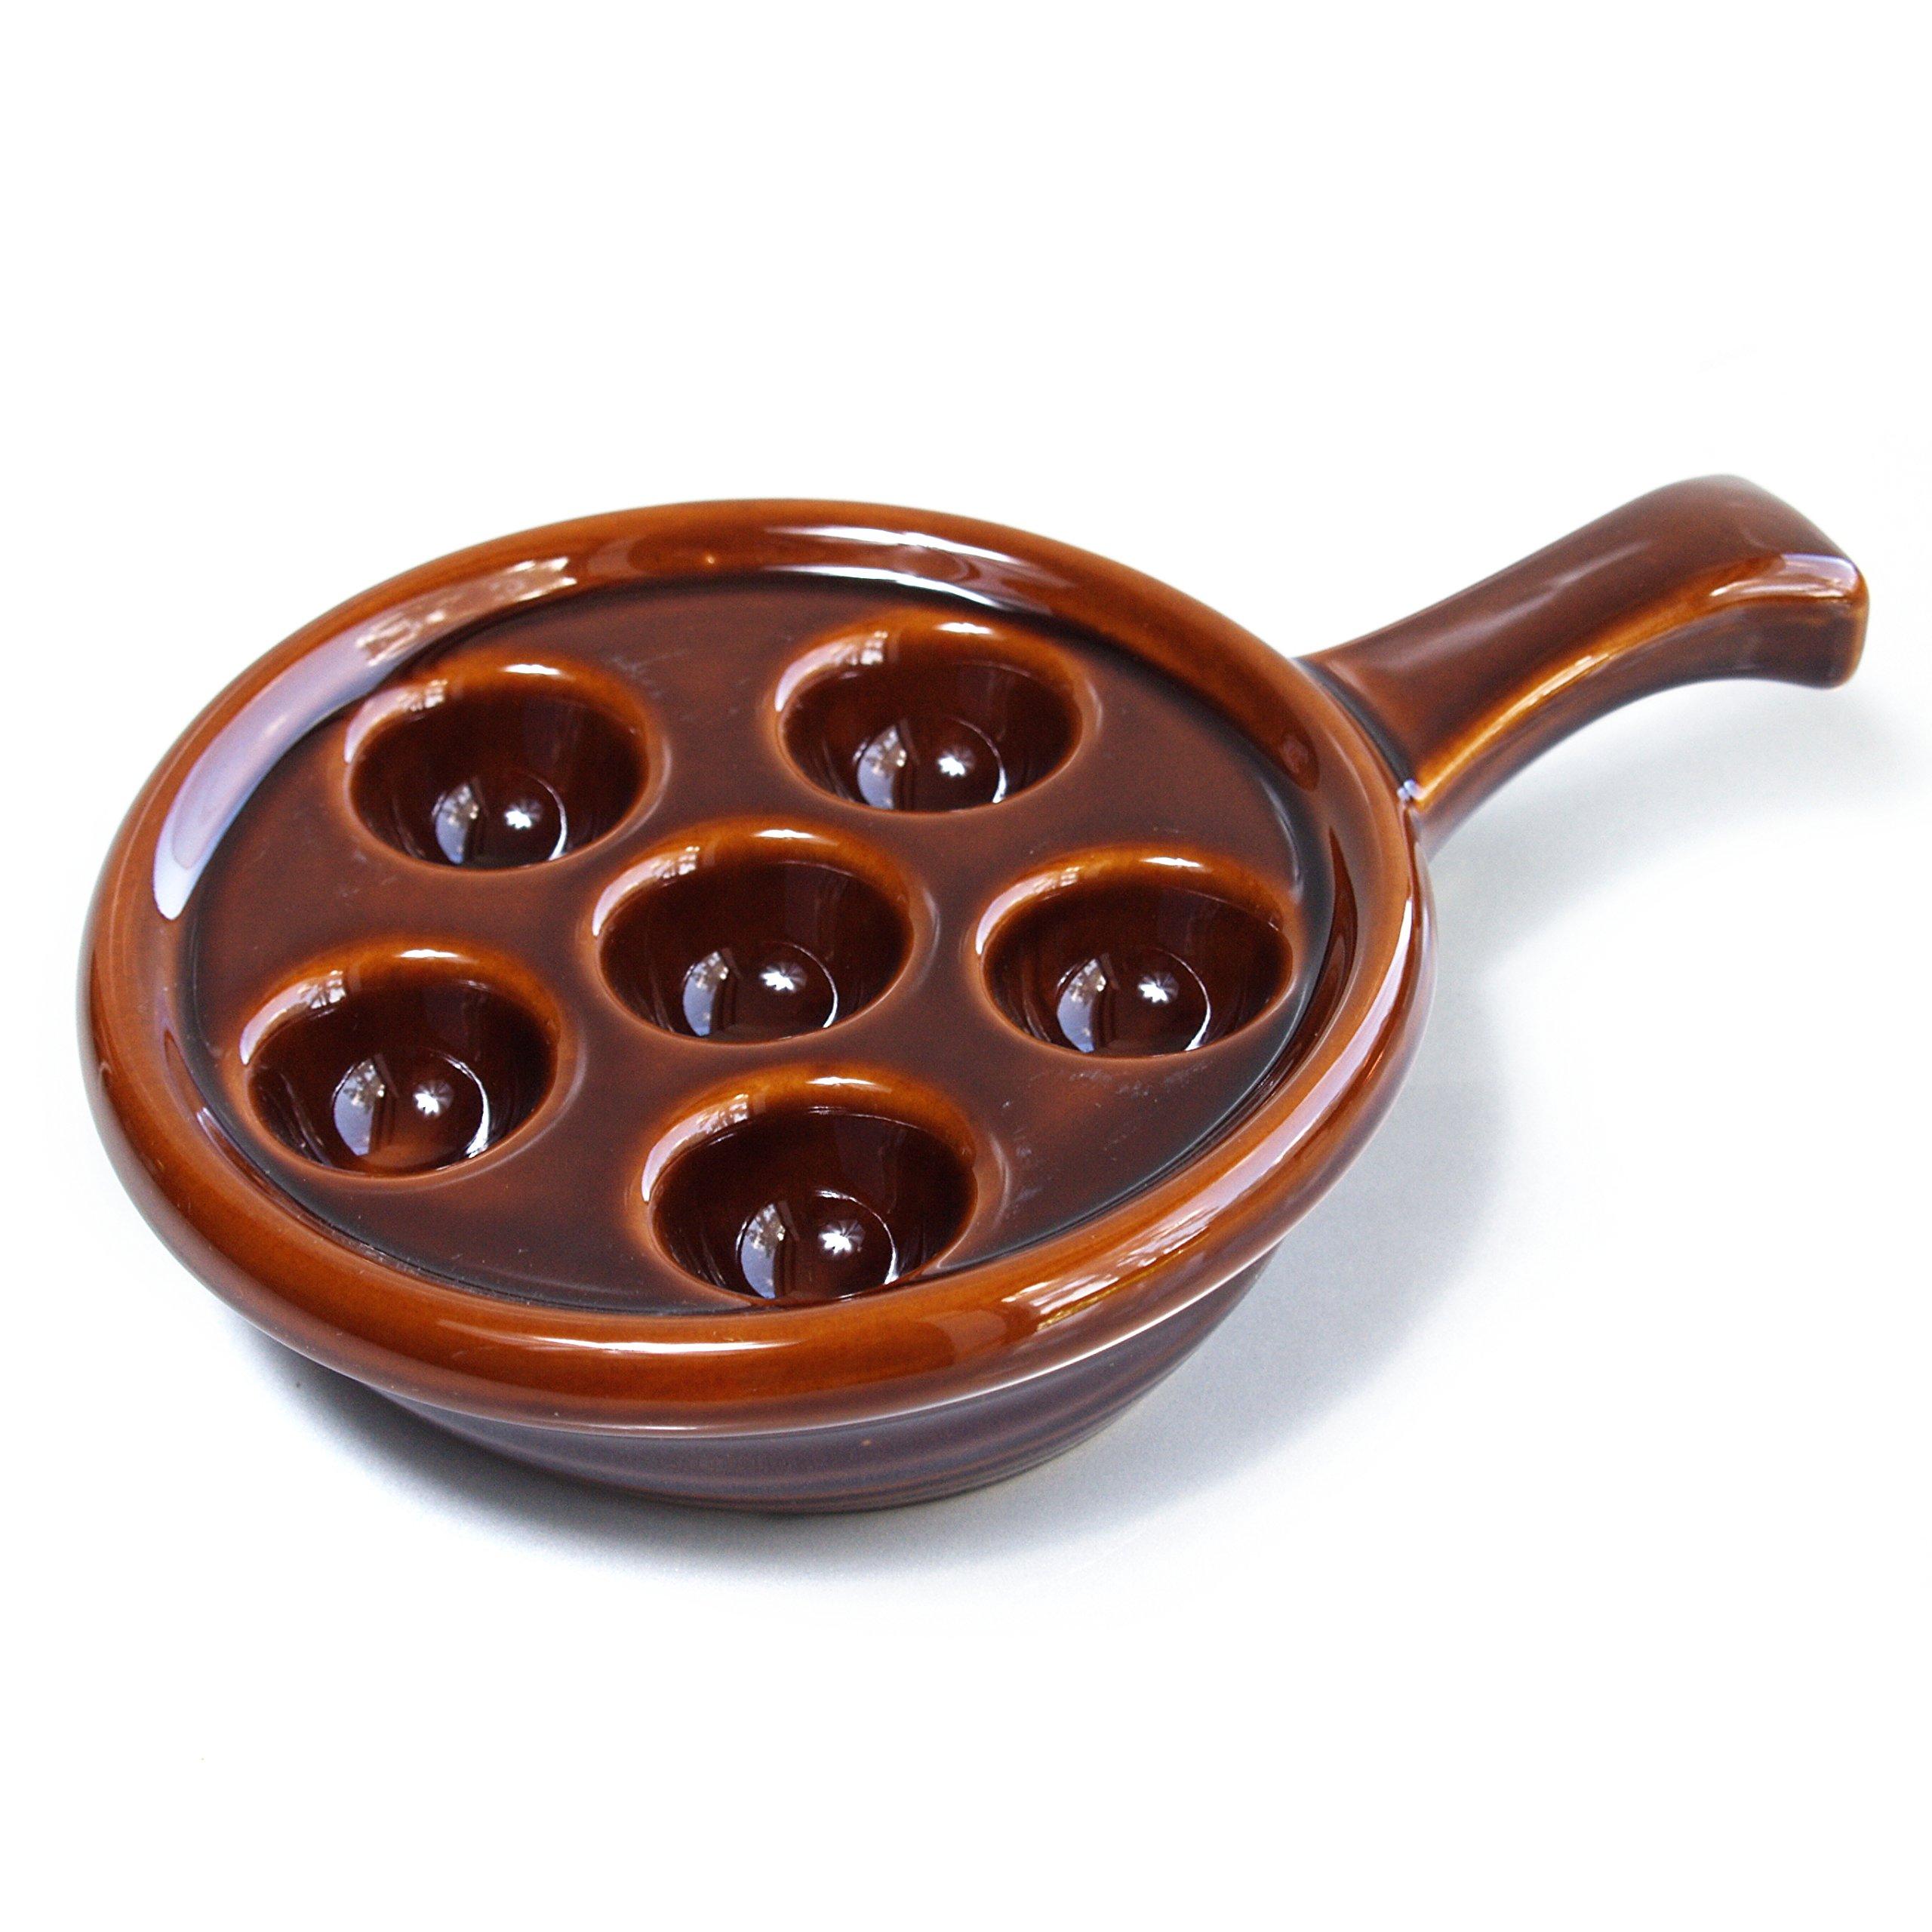 Browne Basics Brown Ceramic 5 Inch Escargot Plate, Set of 4